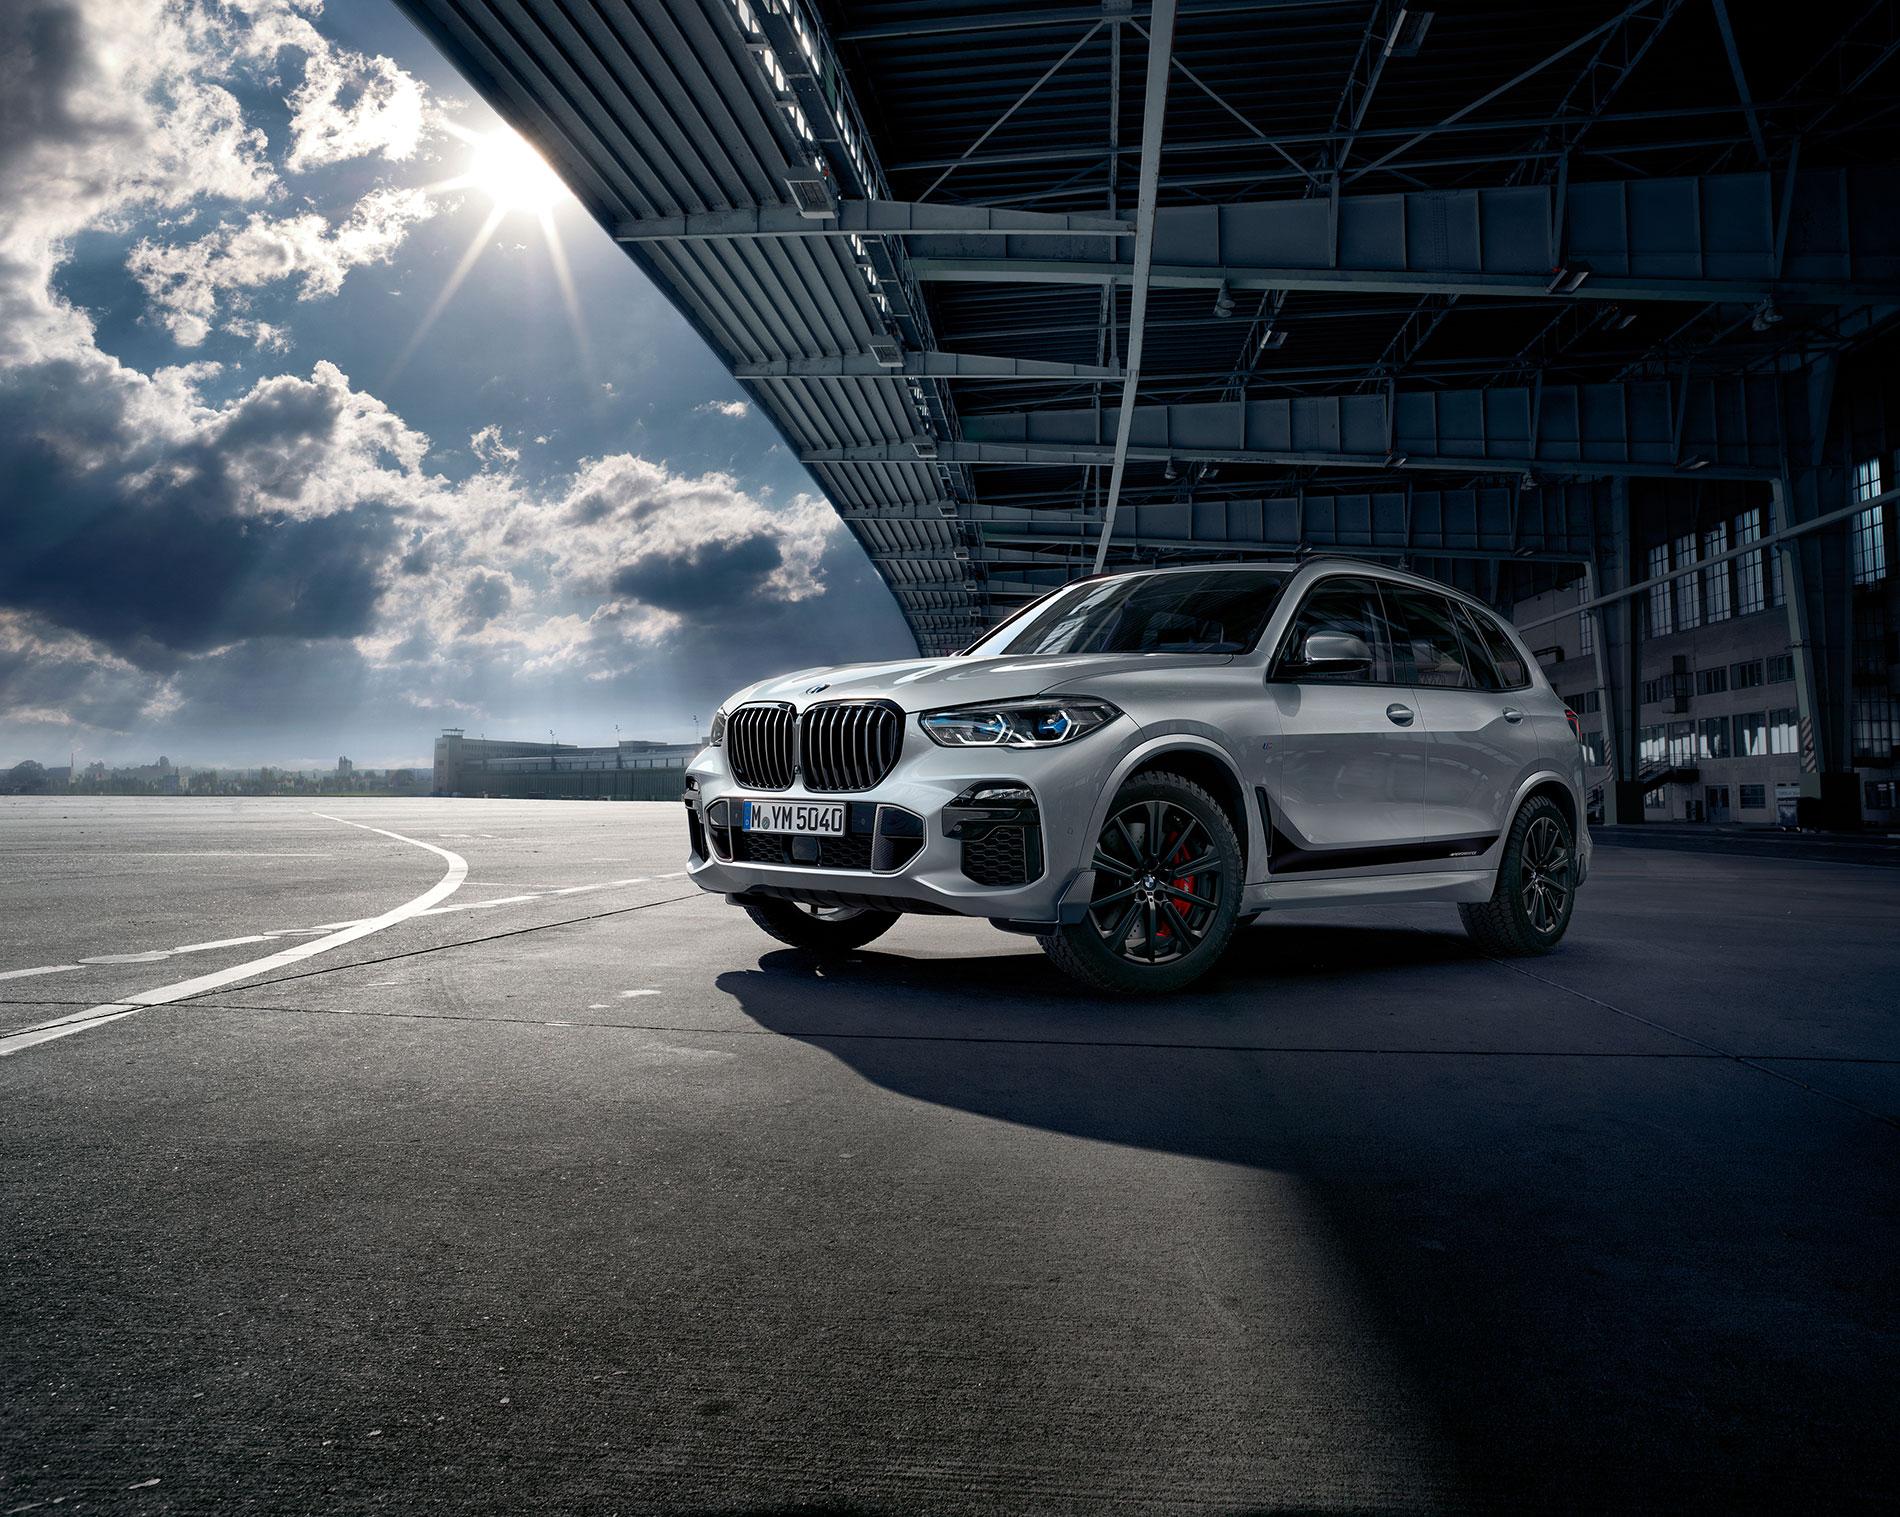 BMW G05 X5 M Performance Parts